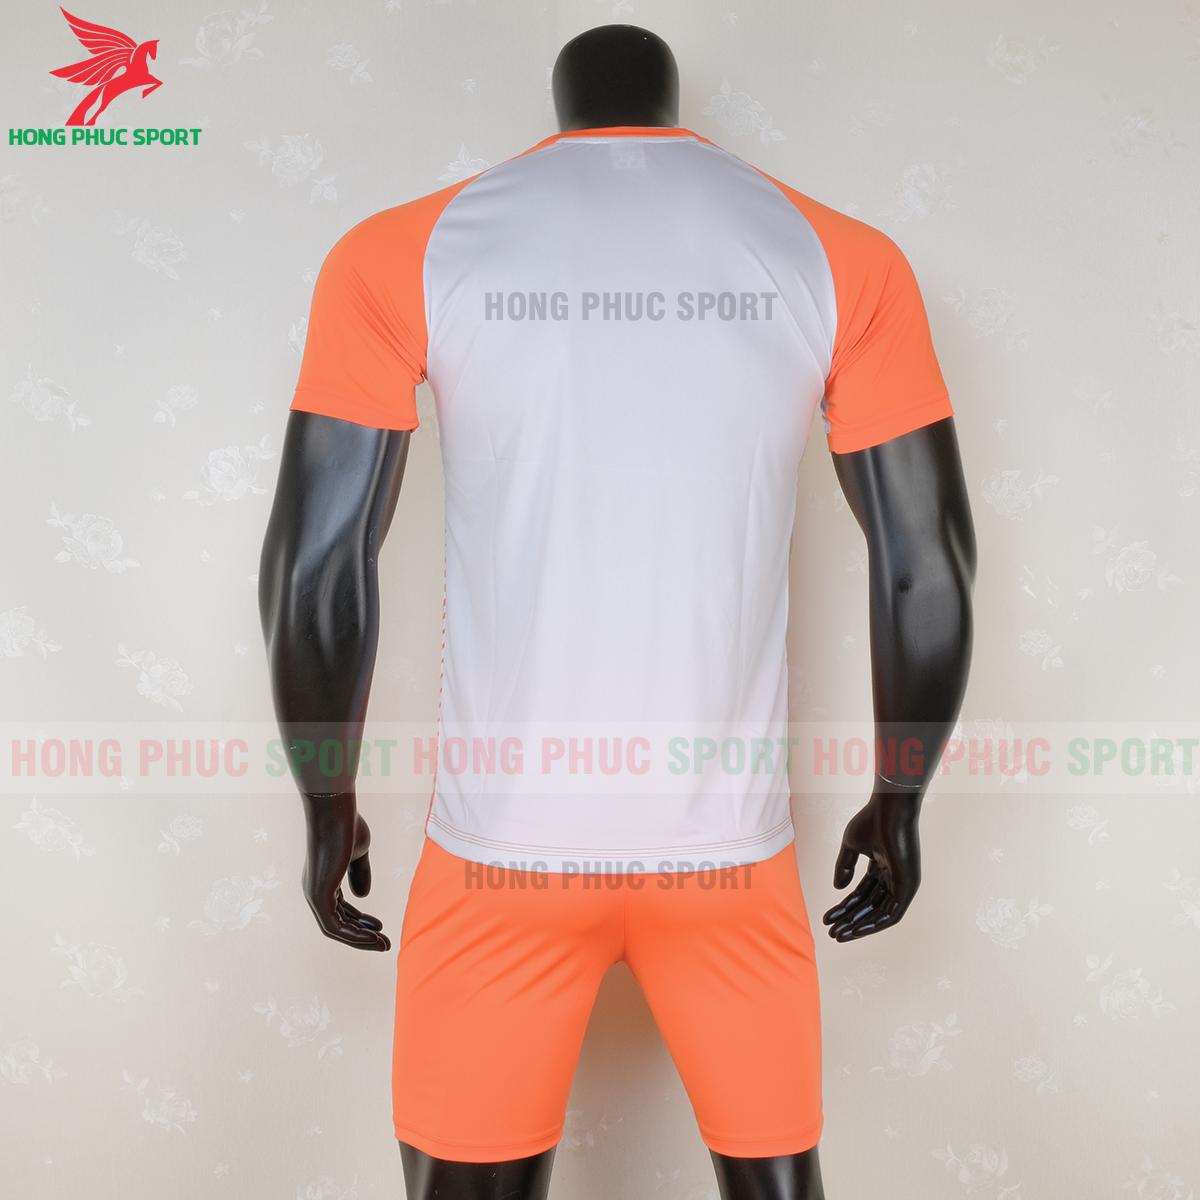 https://cdn.hongphucsport.com/unsafe/s4.shopbay.vn/files/285/ao-bong-da-dortmund-2020-2021-phien-ban-fan-mau-2-2-5f6d563261998.png